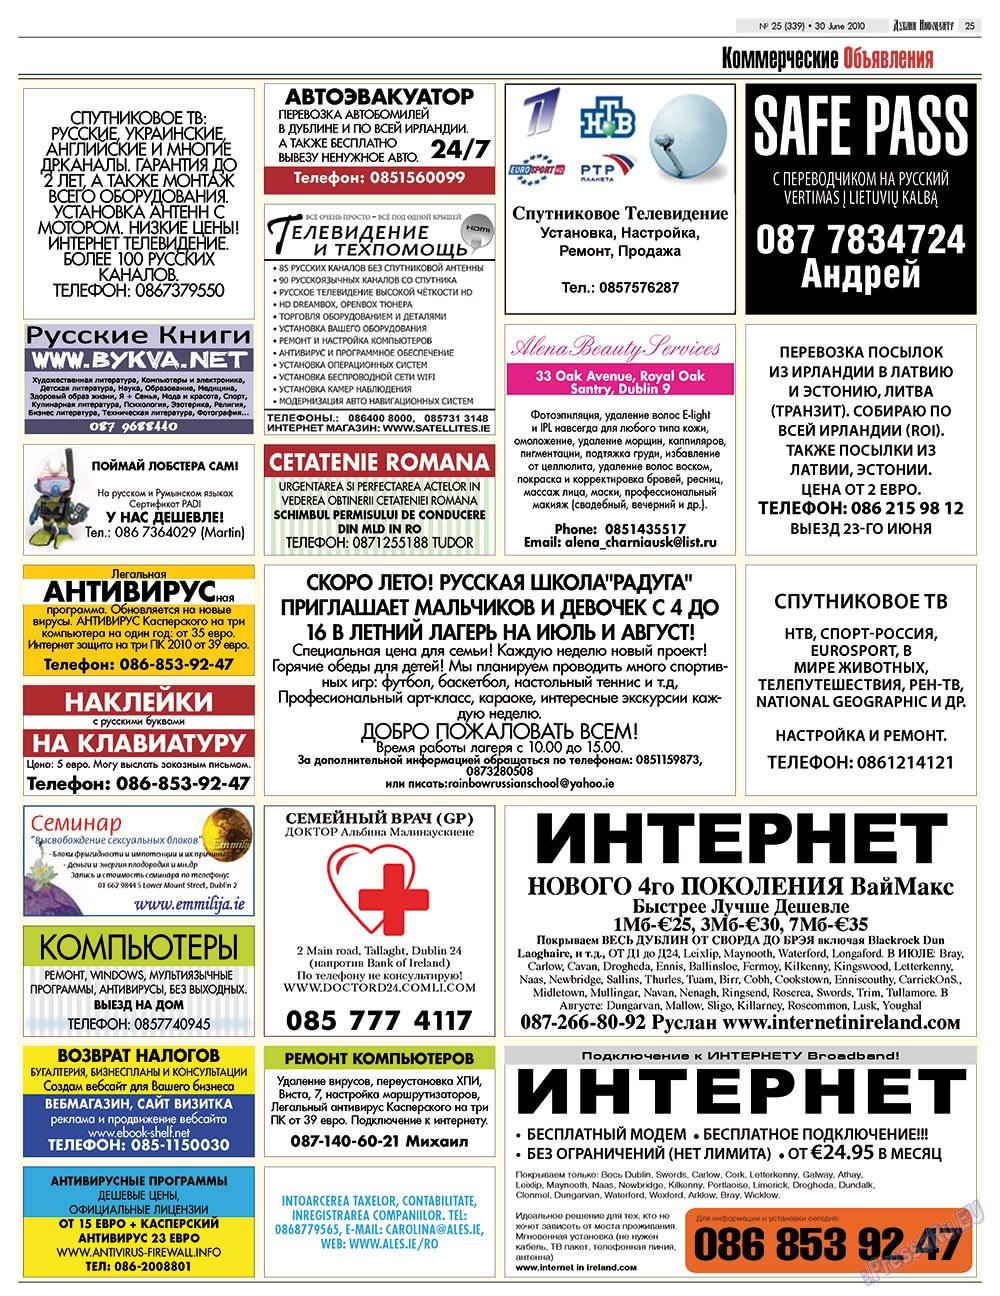 Дублин инфоцентр (газета). 2010 год, номер 25, стр. 25